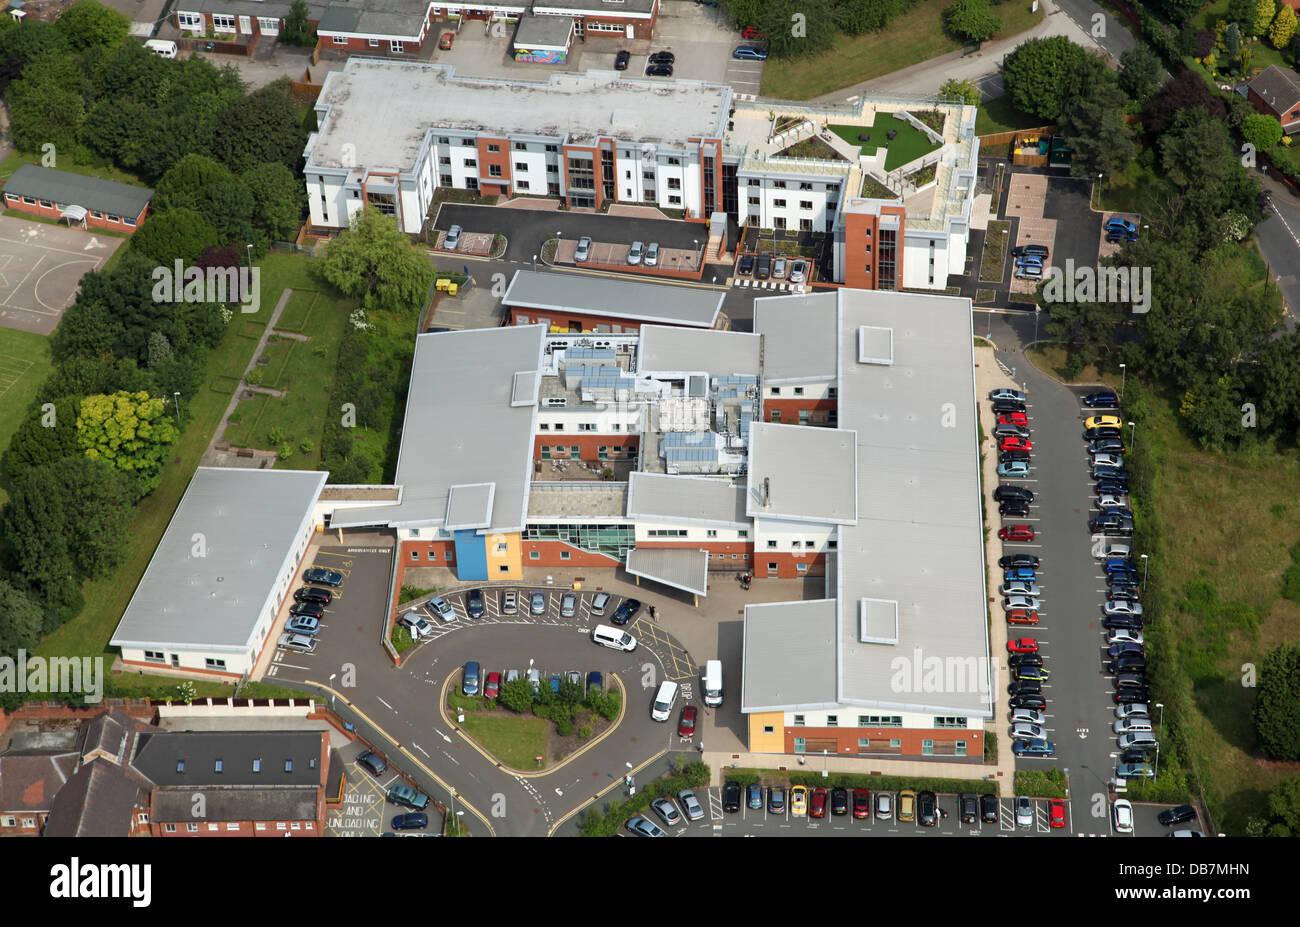 aerial view of Samuel Johnson Community Hospital in Lichfield, Staffordshire - Stock Image